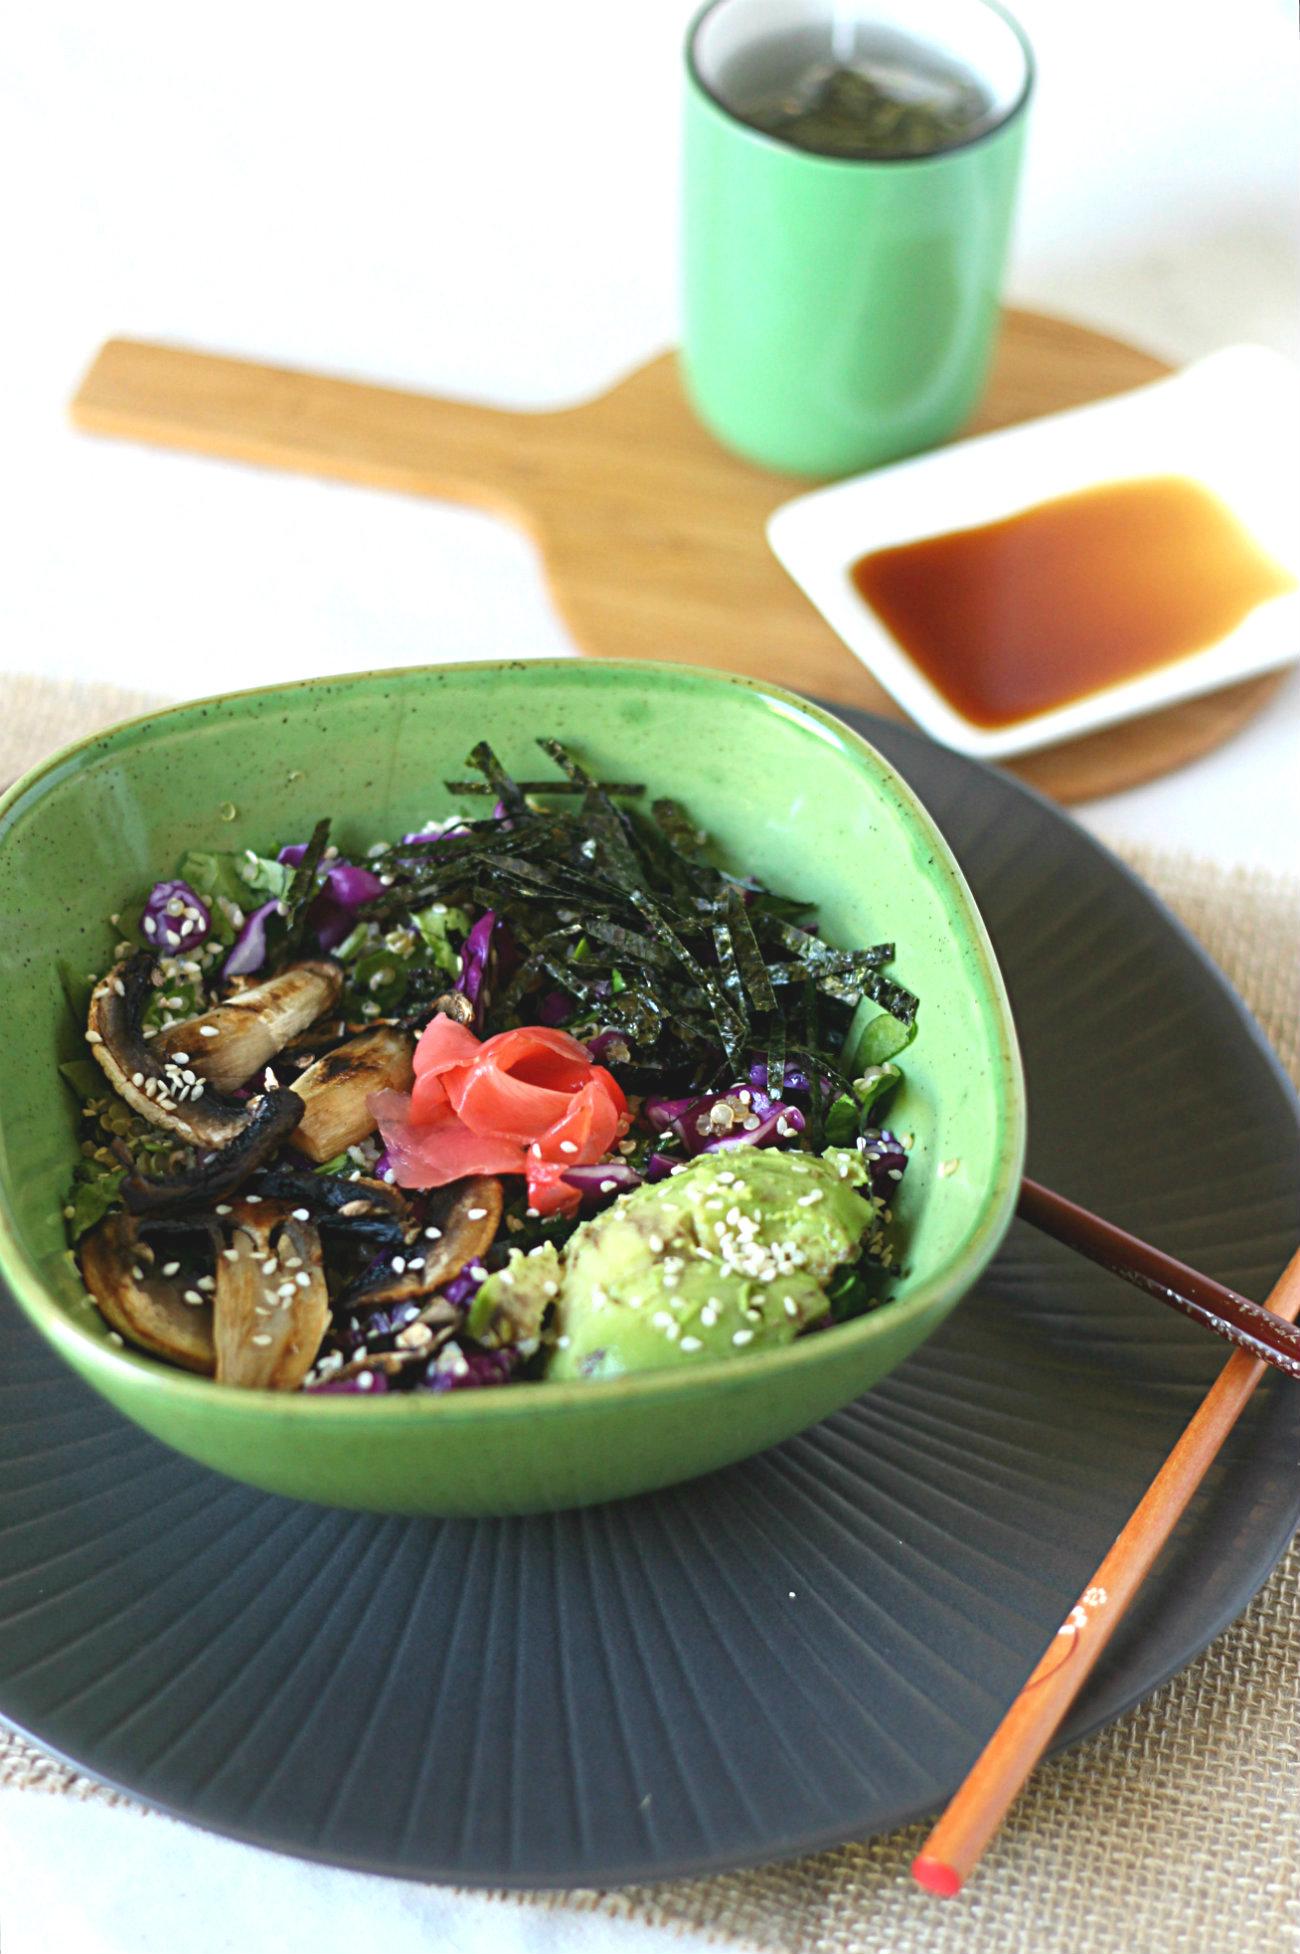 Grain-free sushi bowls